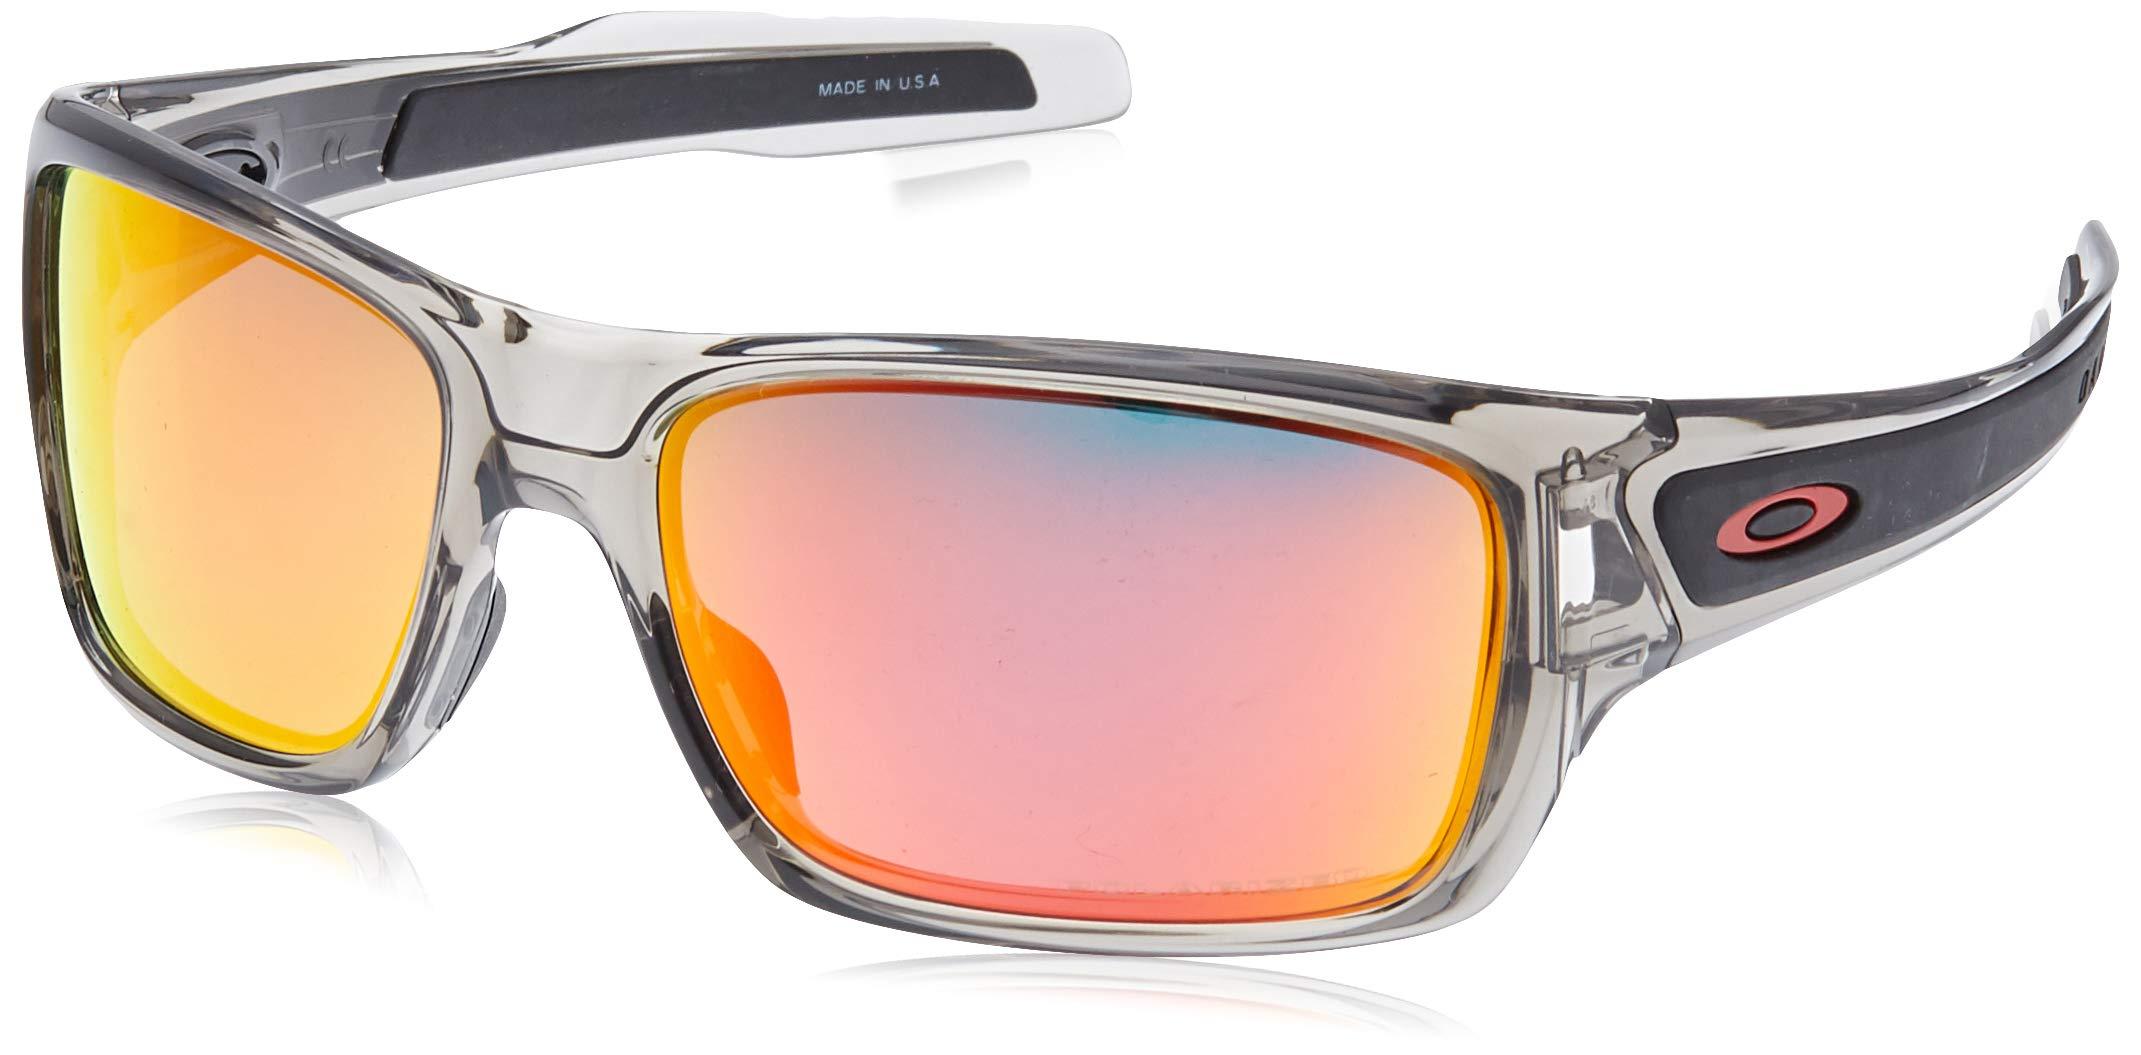 Oakley Men's OO9263 Turbine Rectangular Sunglasses, Grey Ink/Ruby Iridium Polarized, 65 mm by Oakley